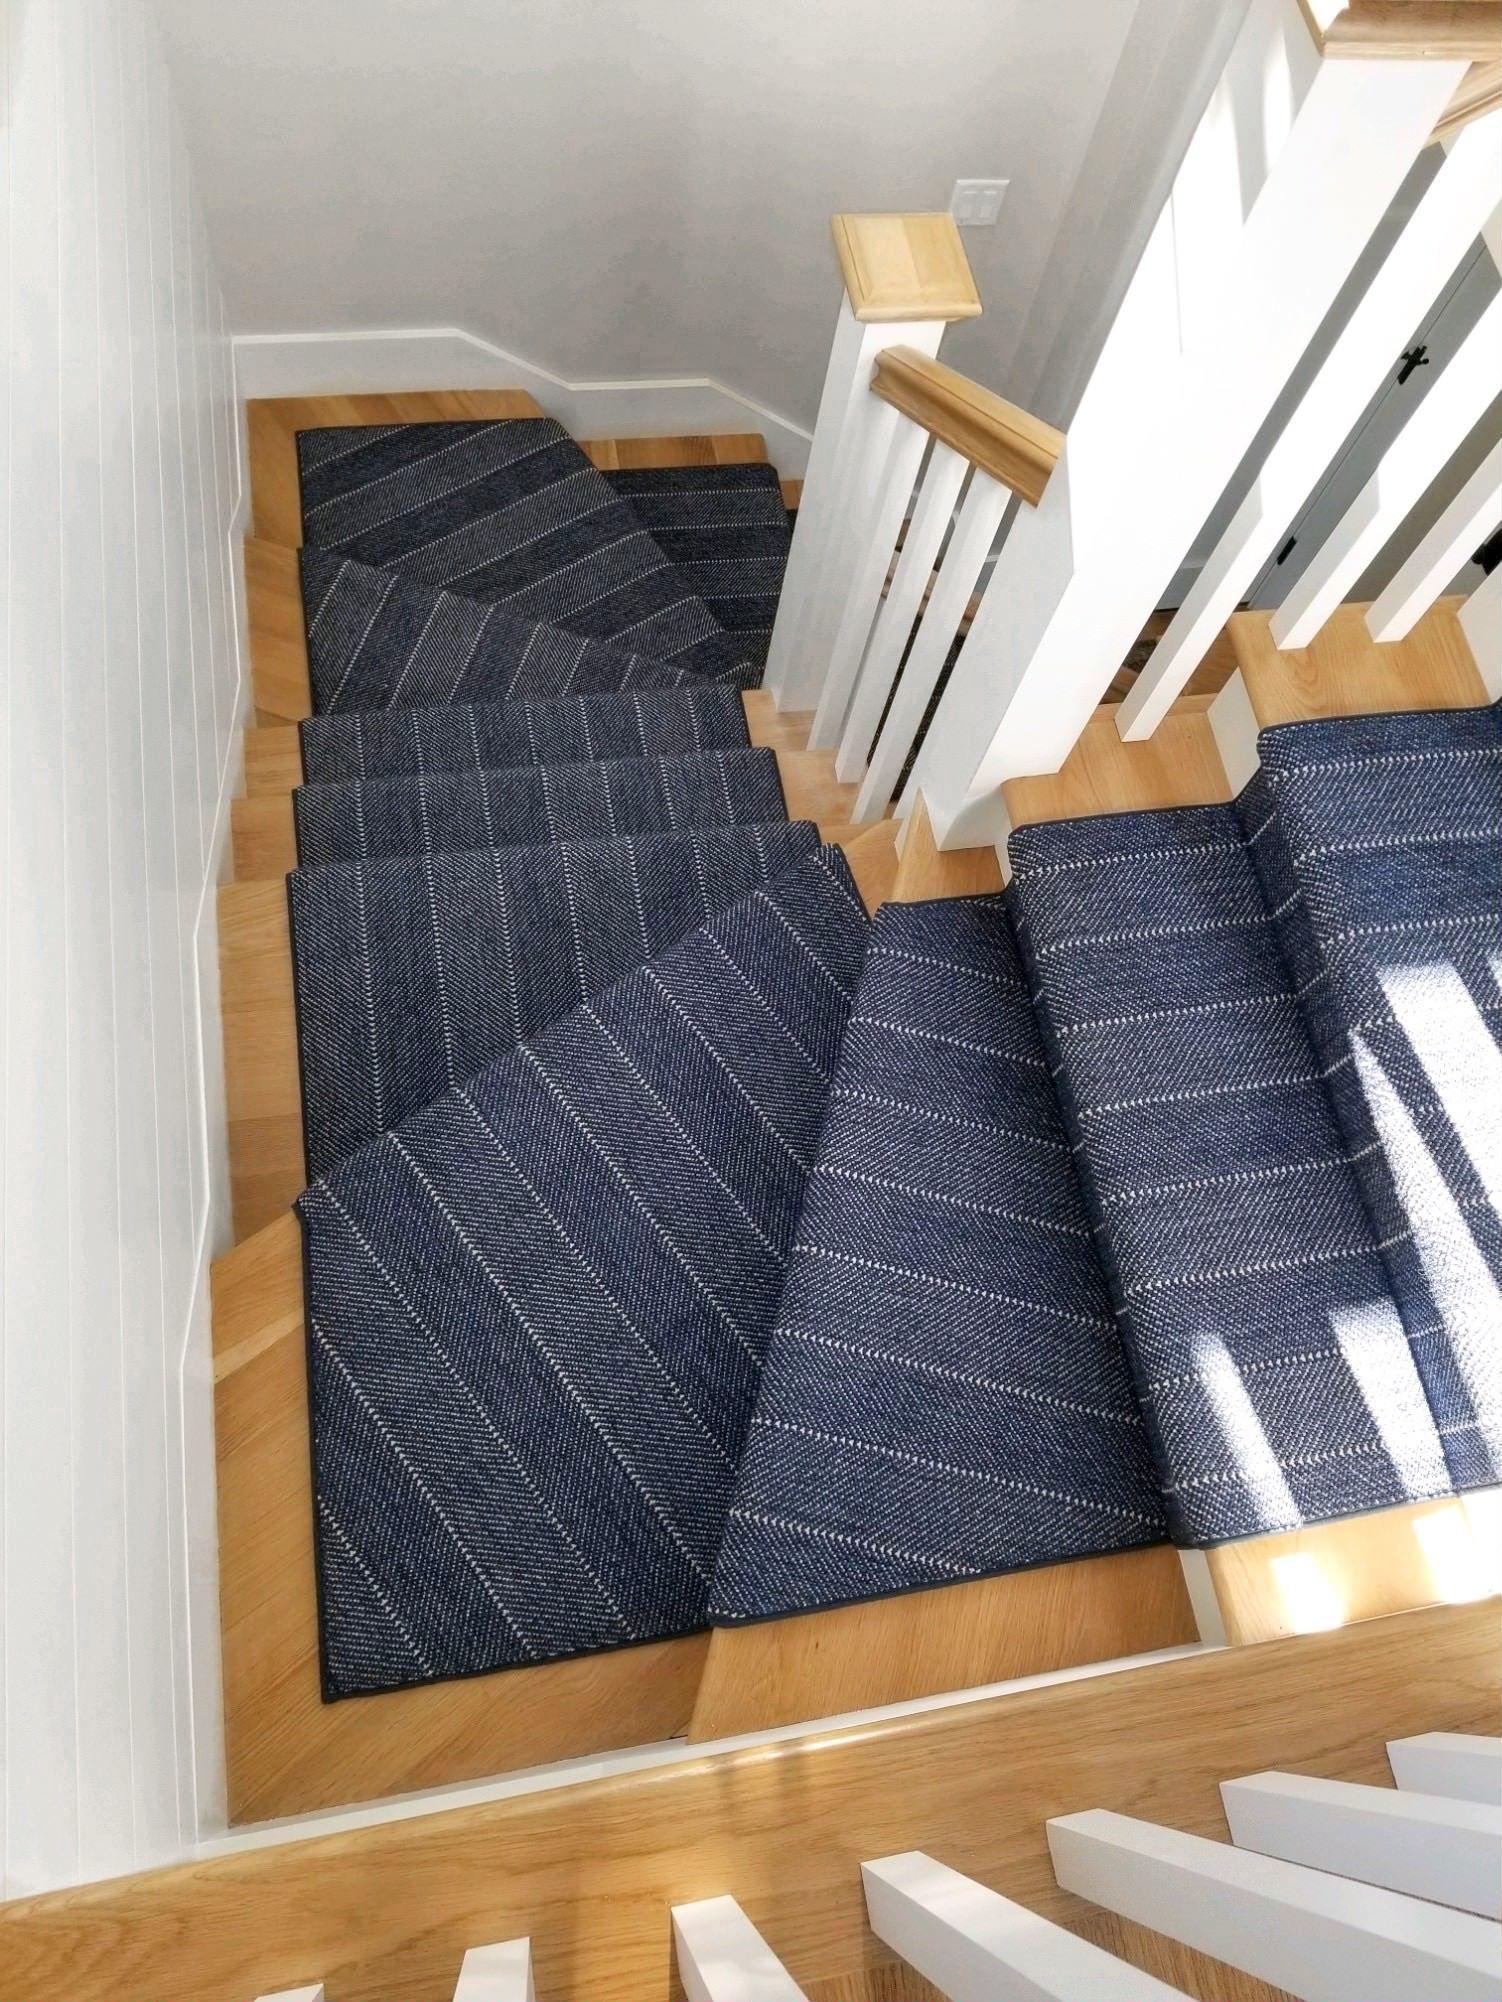 Nautical Stair Runner Flooring Trends Stair Runner House Styles